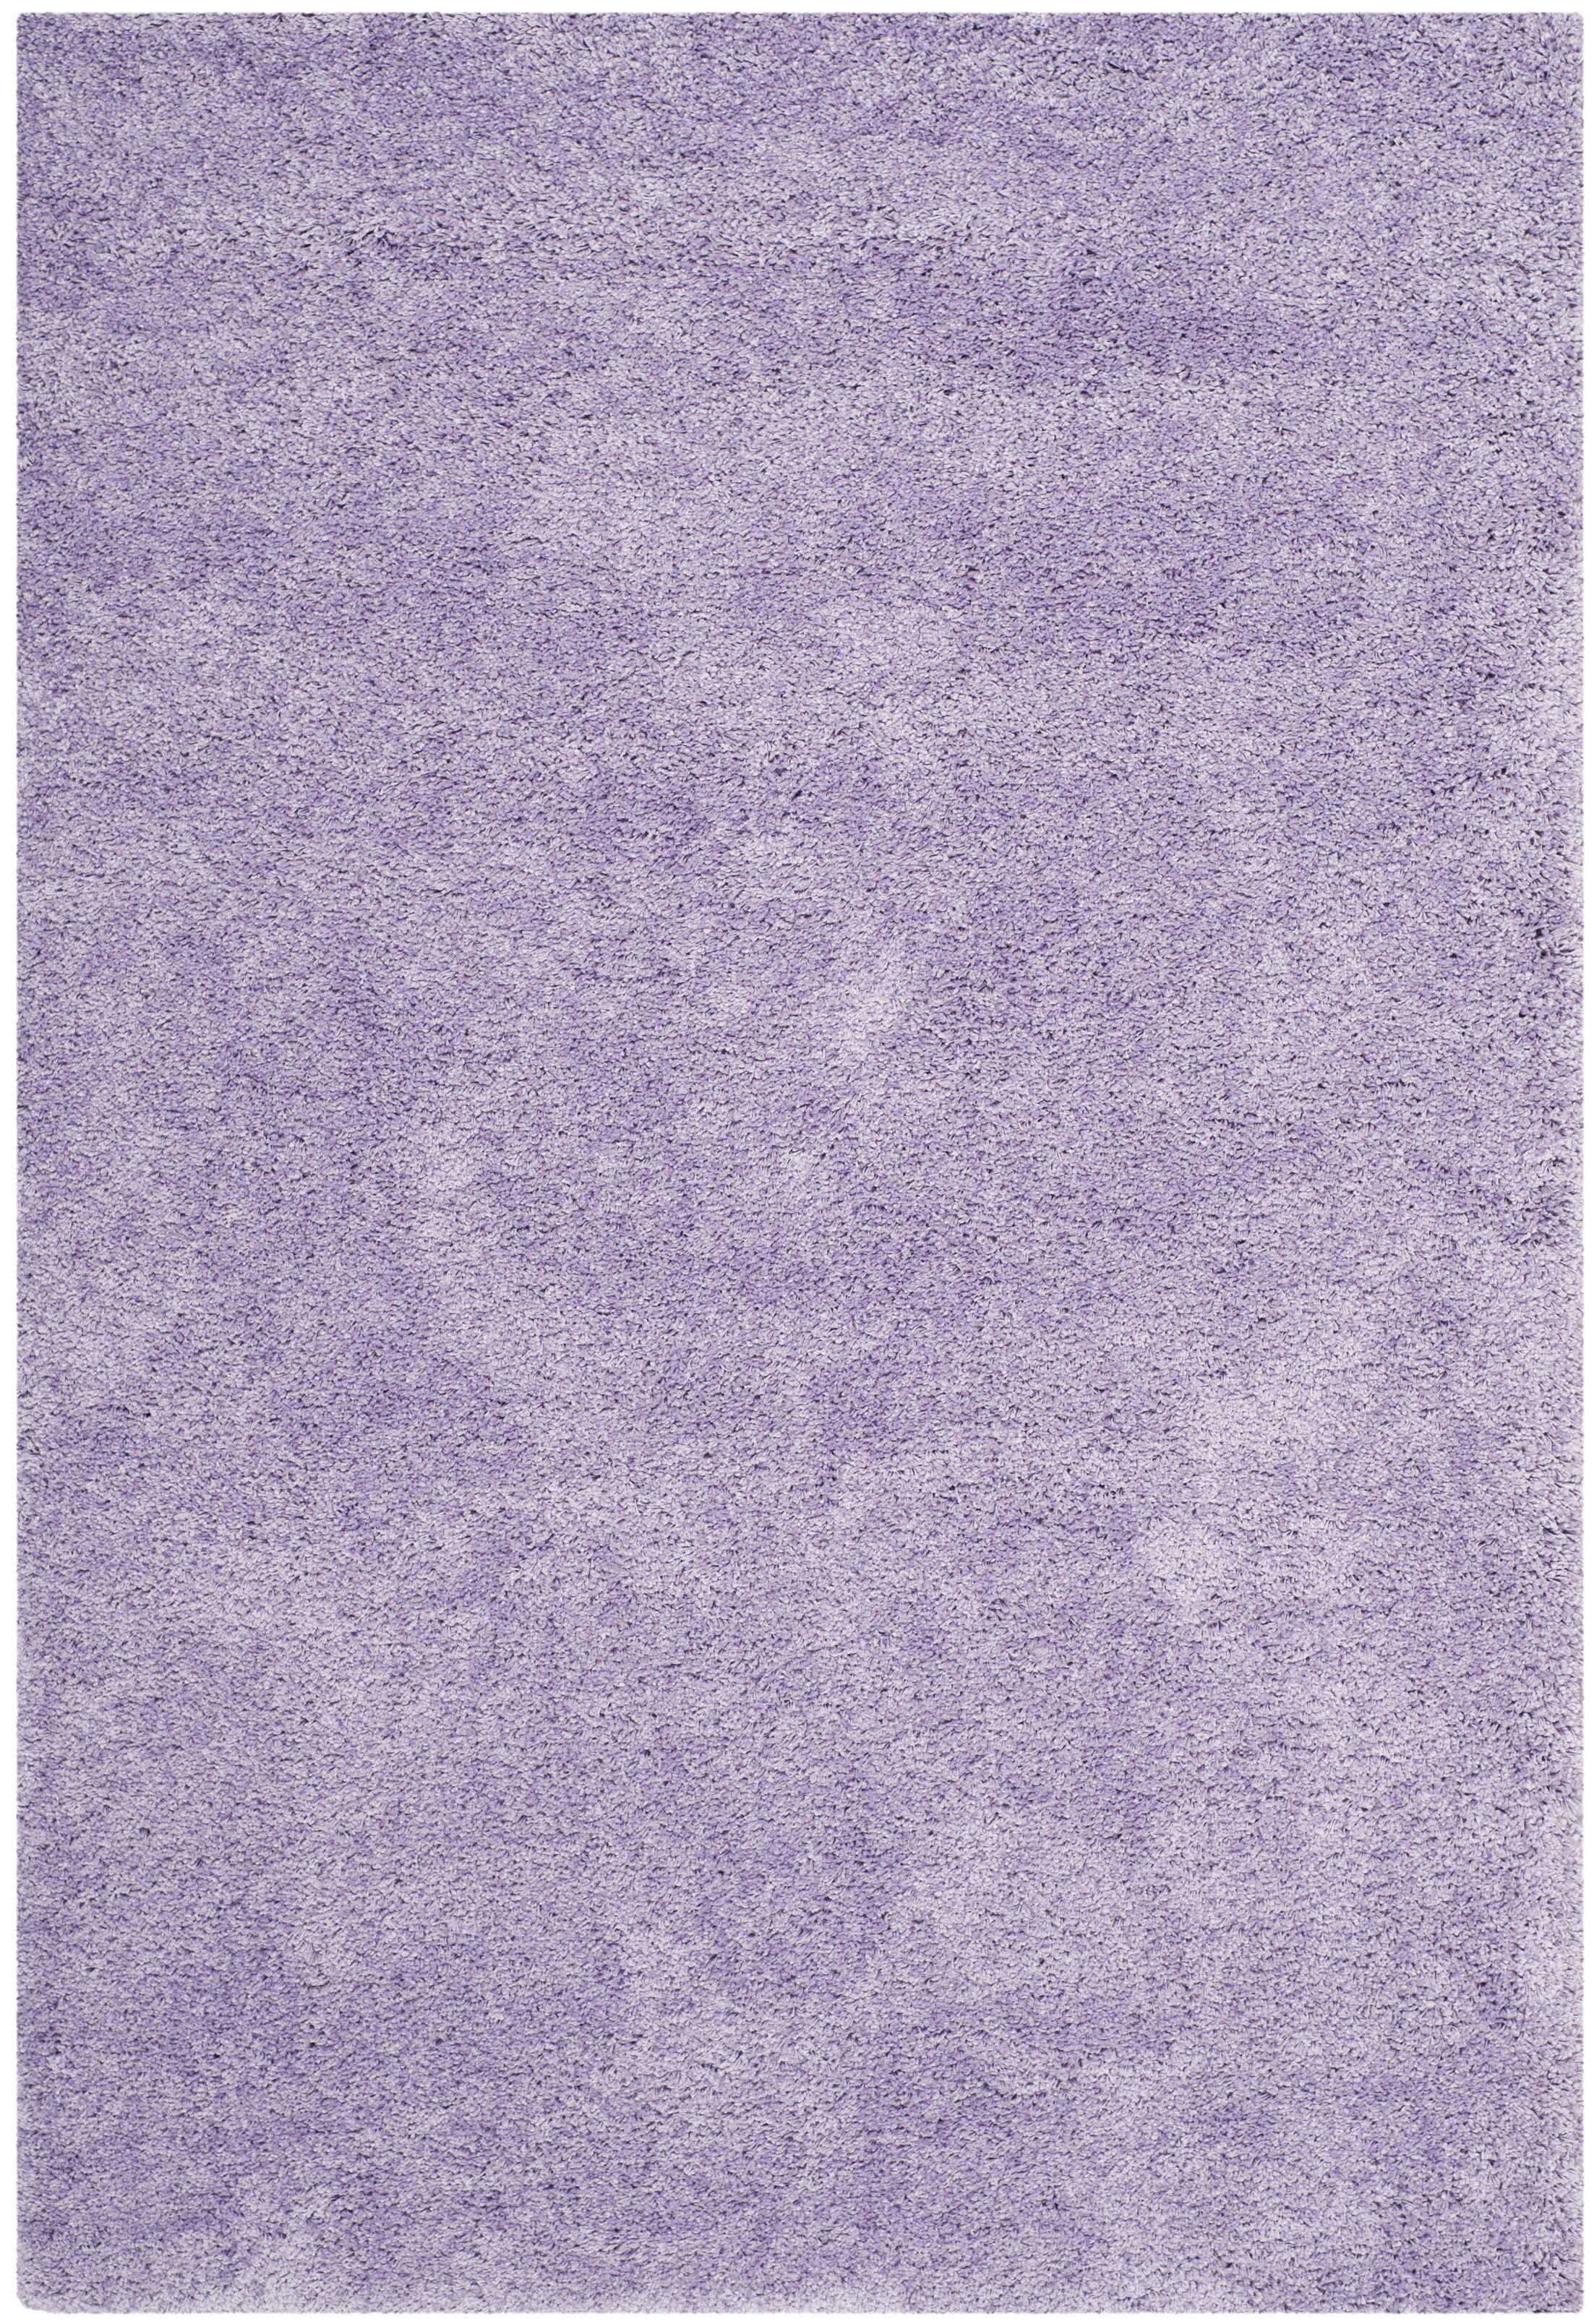 Ariel Lilac Shag Area Rug Rug Size: Rectangle 4' x 6'